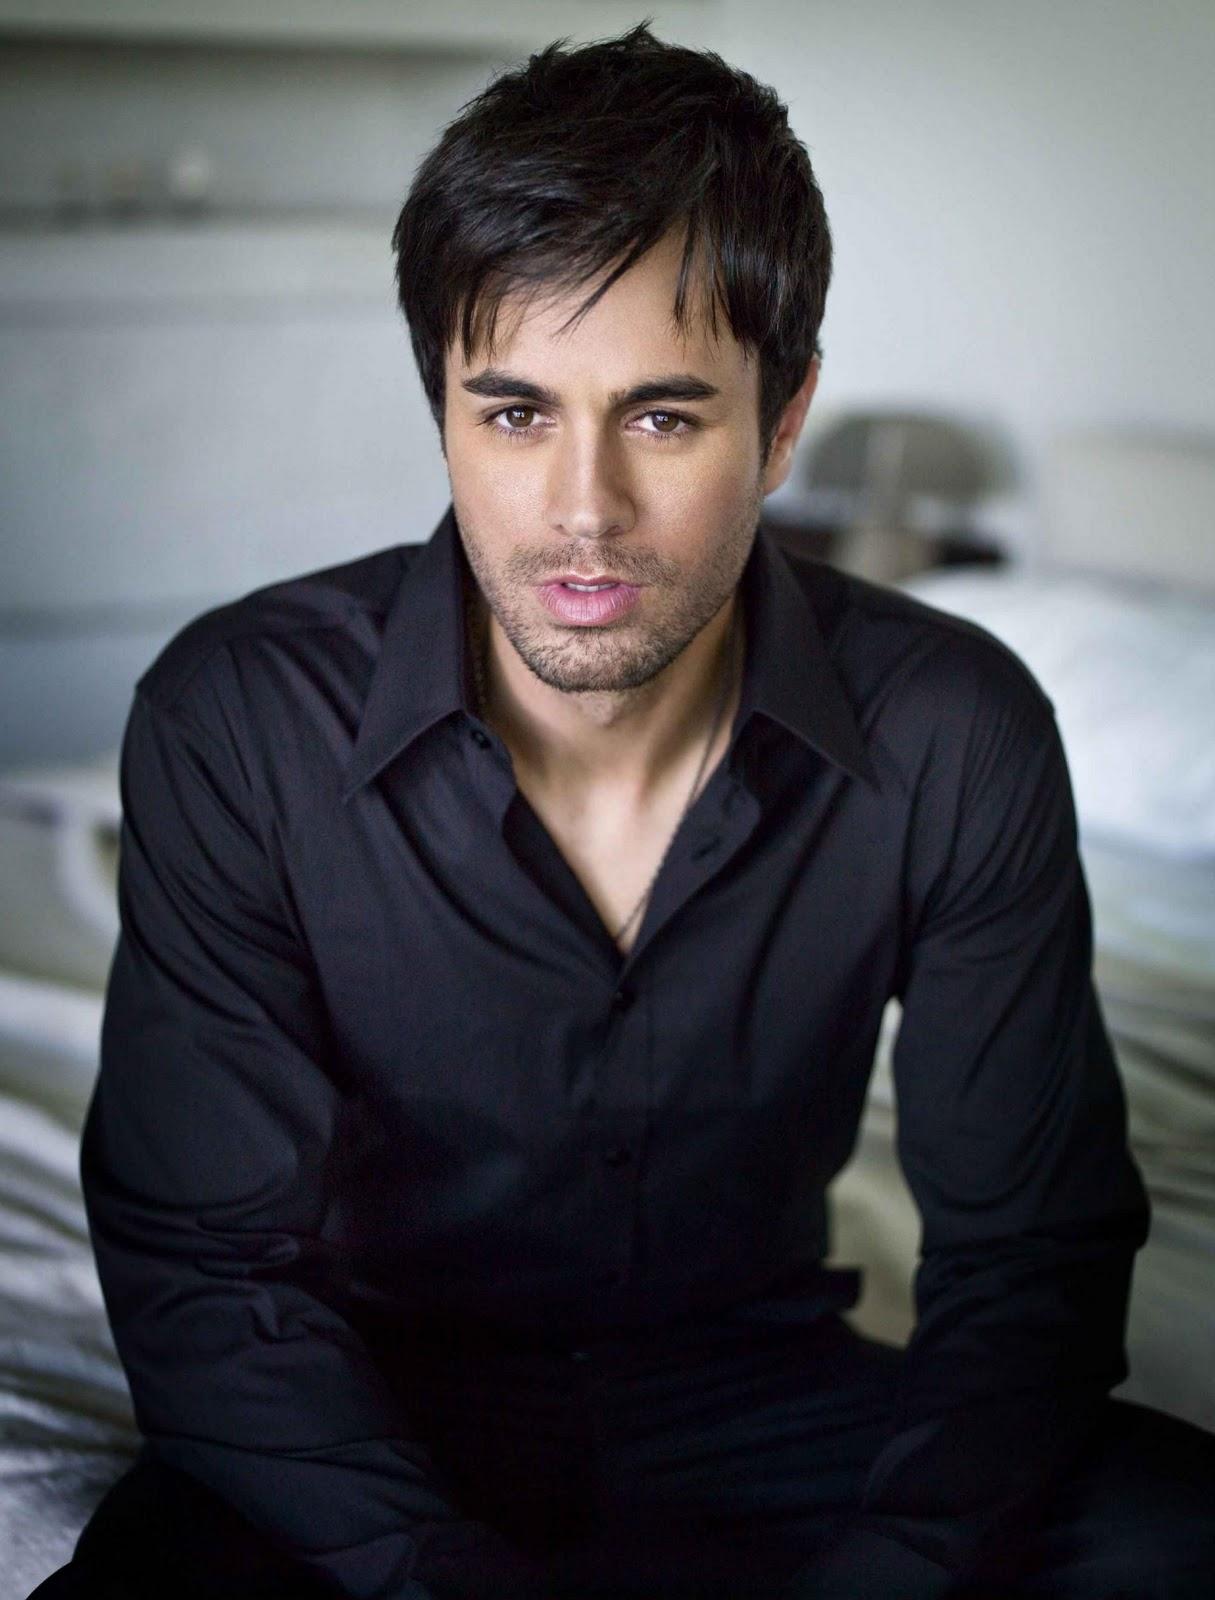 http://3.bp.blogspot.com/_lIyFl0bgYNU/TVLU8drLrmI/AAAAAAAAAio/dFuAyFGF0TA/s1600/Enrique+2.jpg